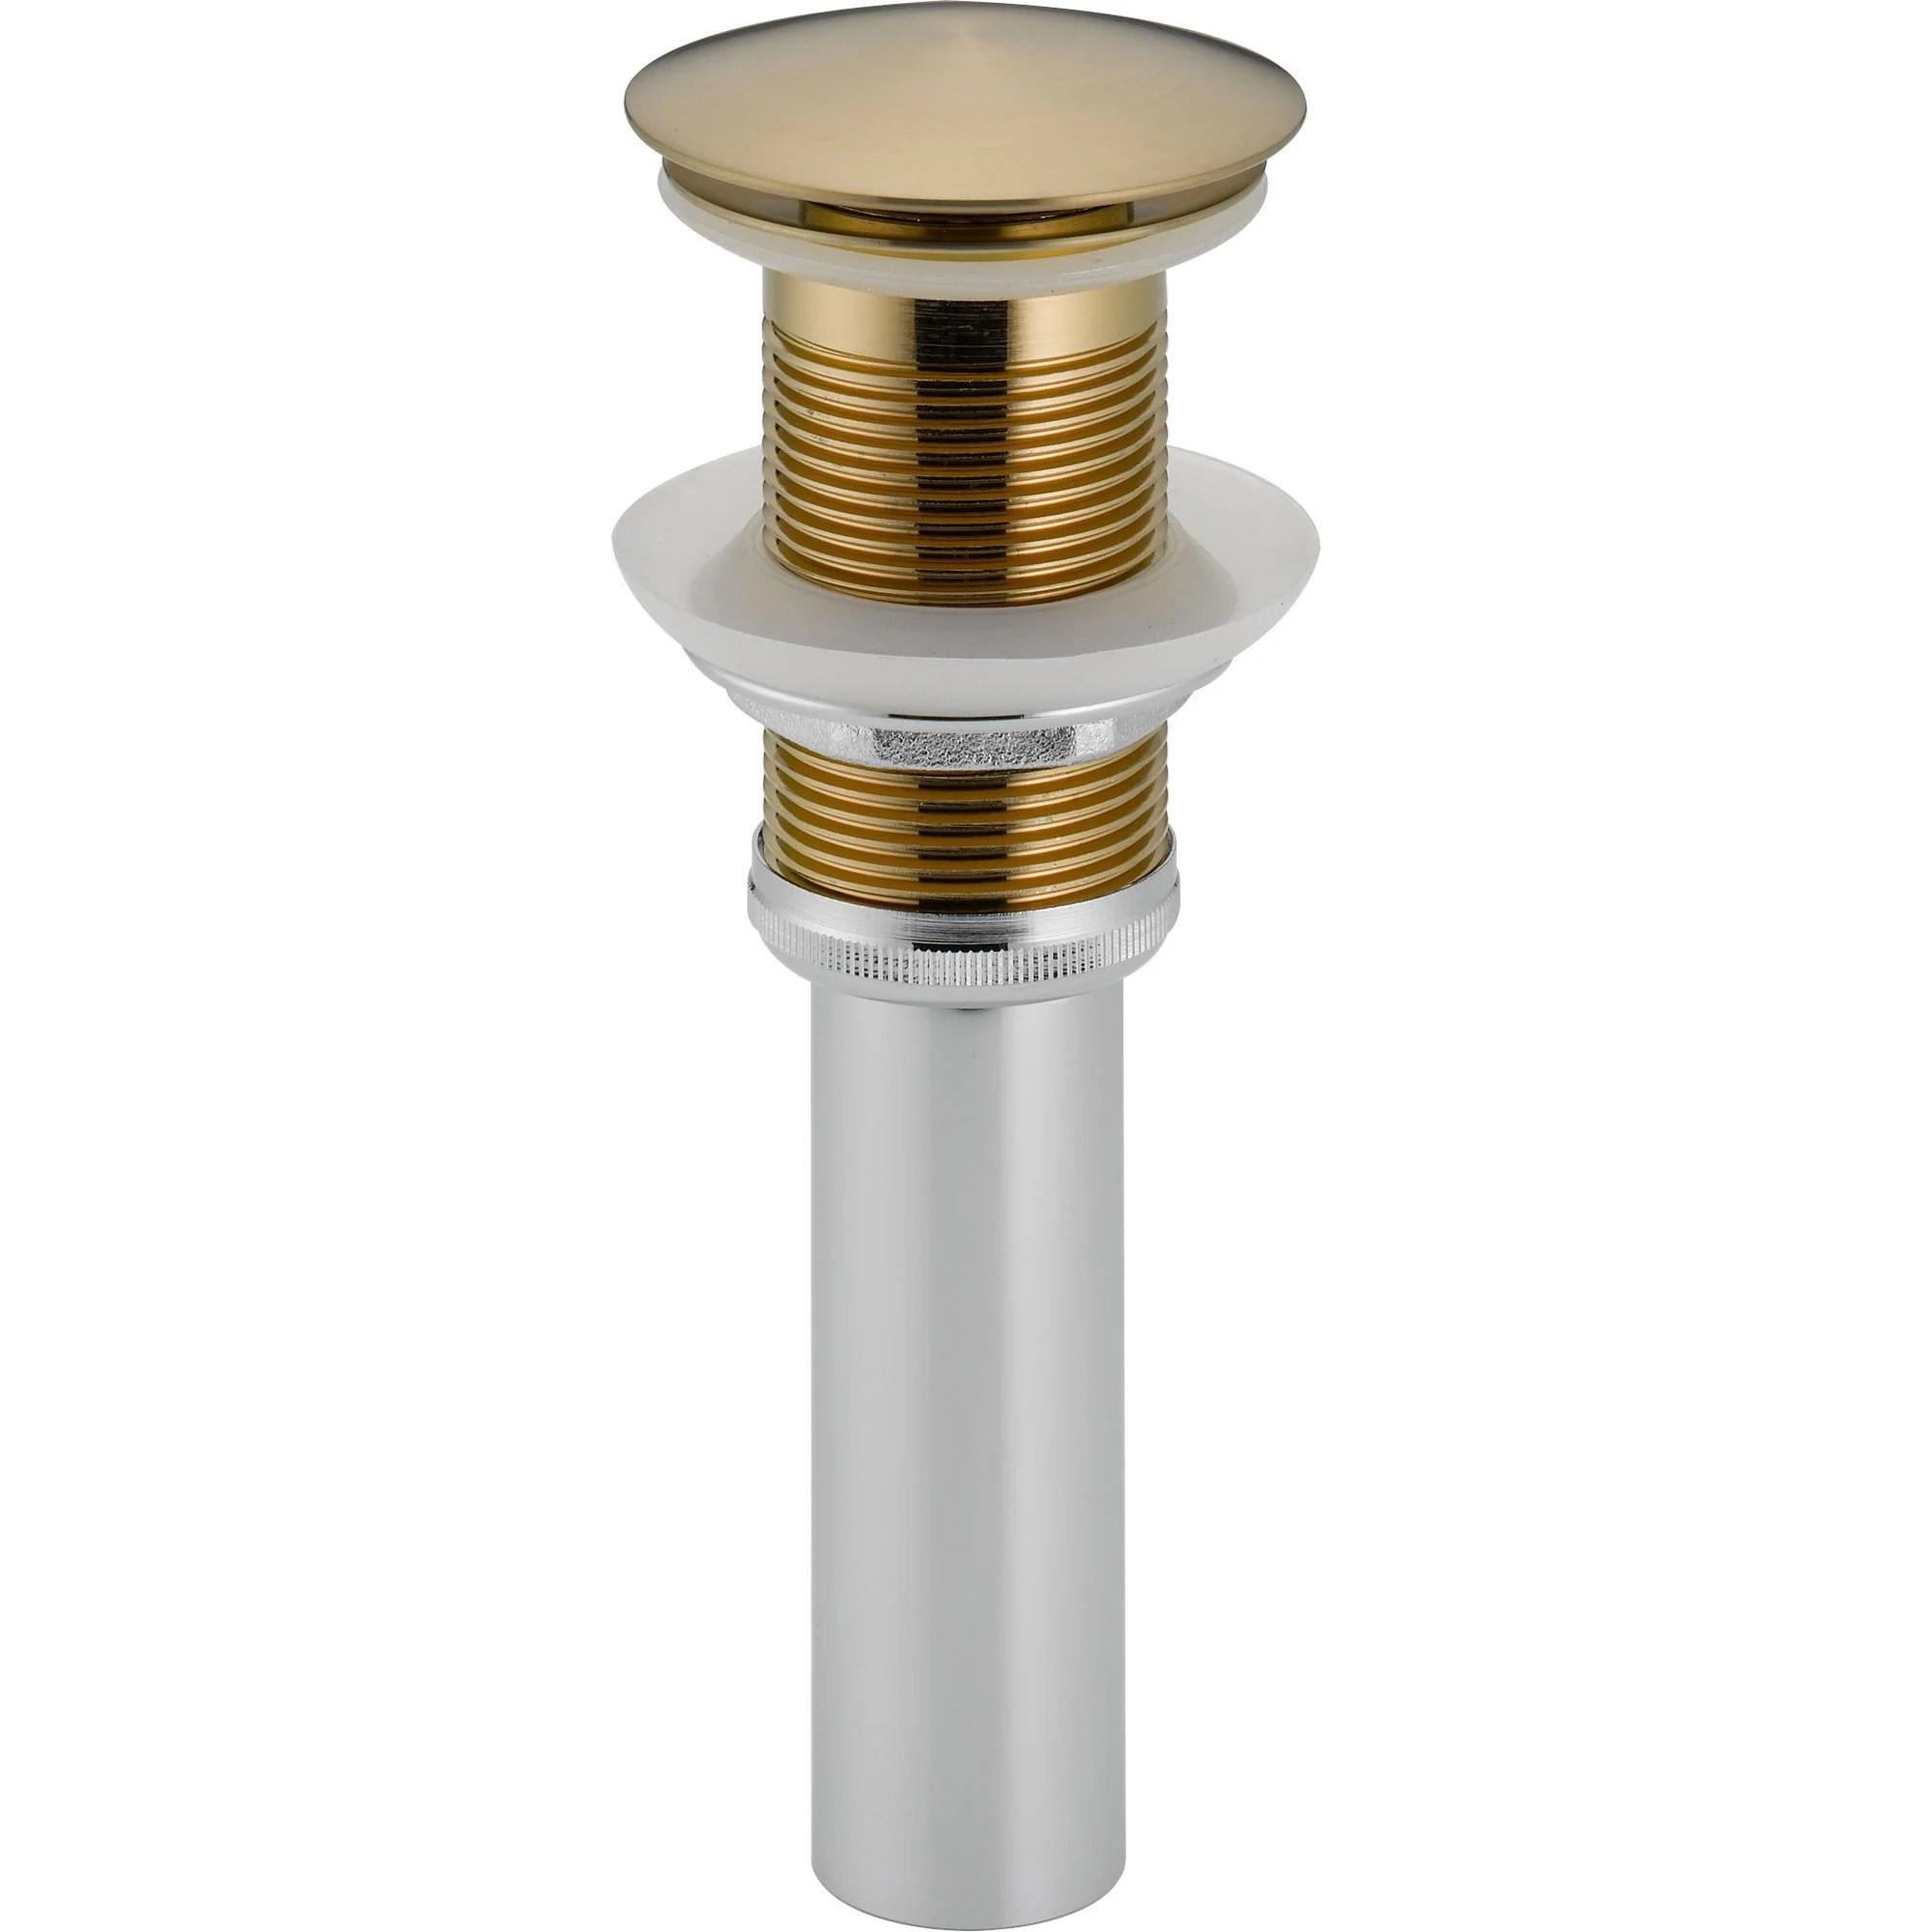 delta champagne bronze push pop up bathroom sink drain without overflow 525027